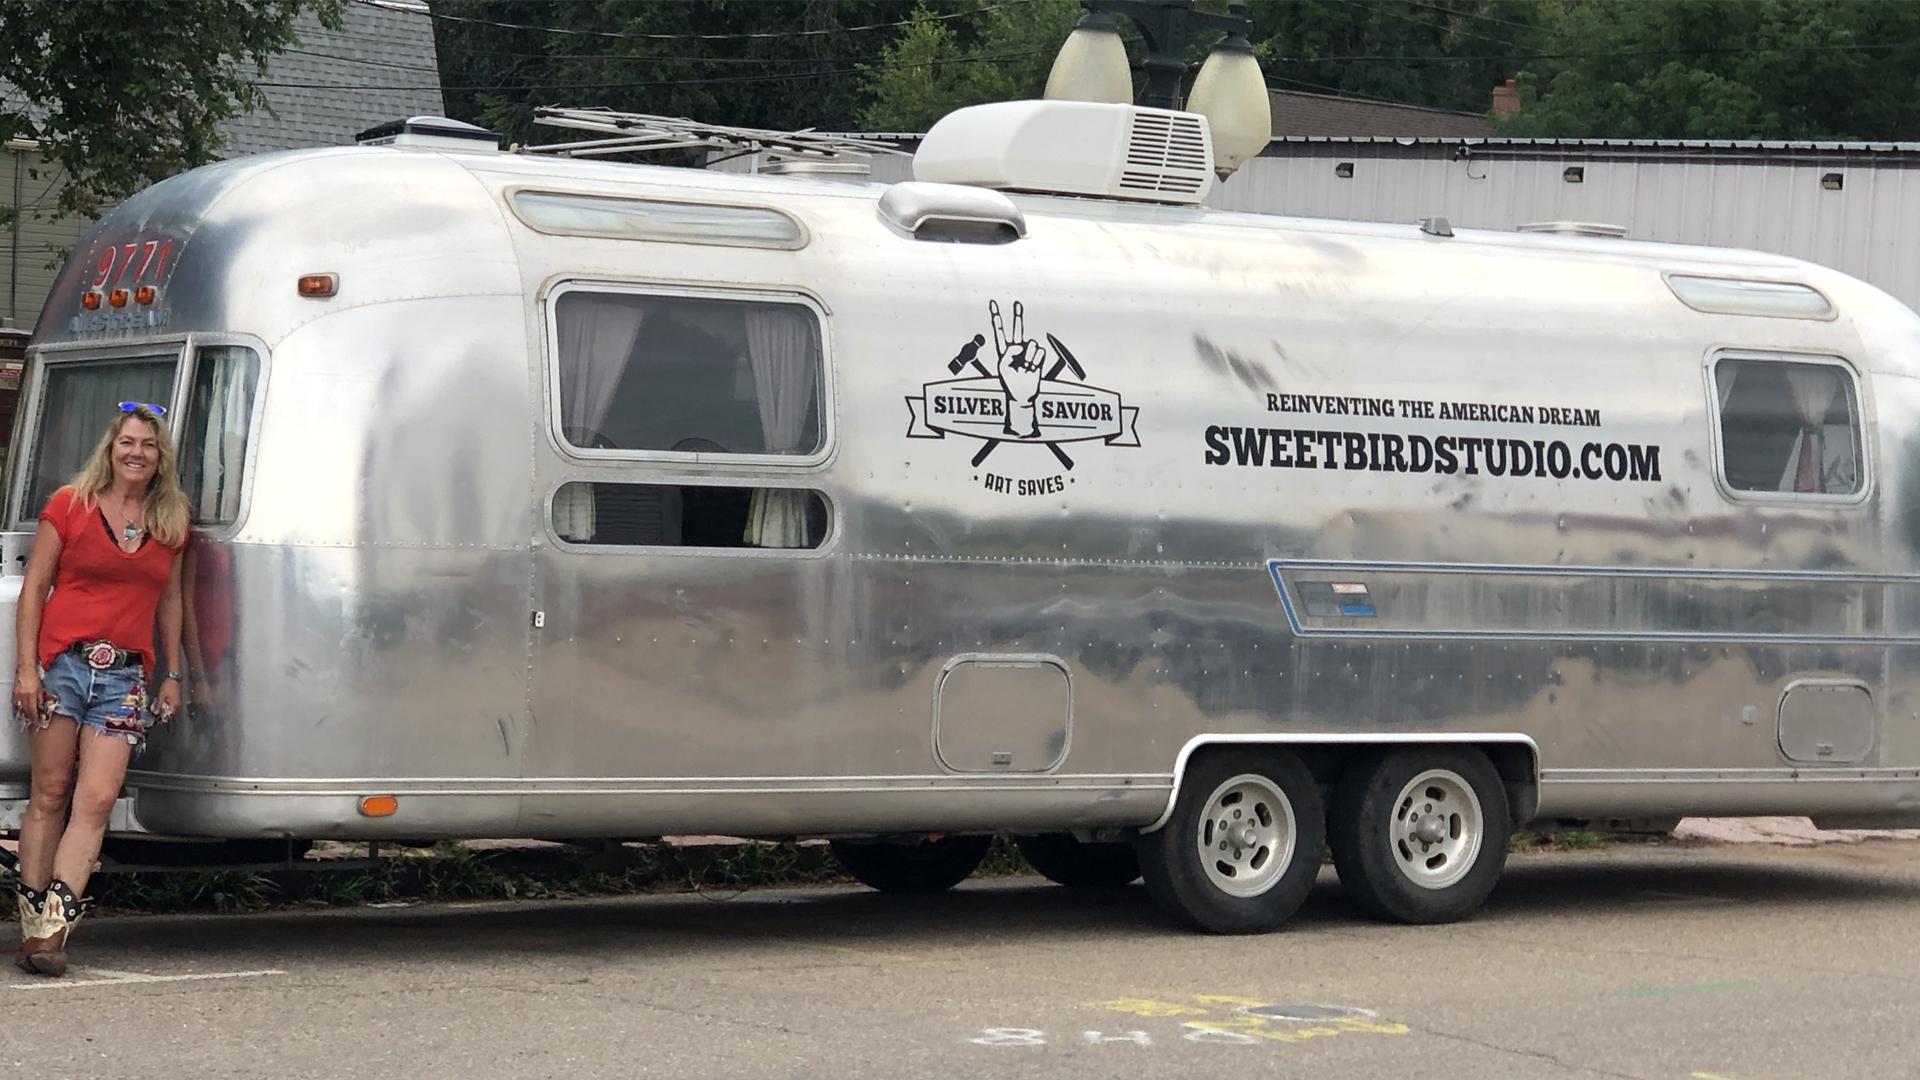 Airstream Travel Trailer Sweet Bird Studio